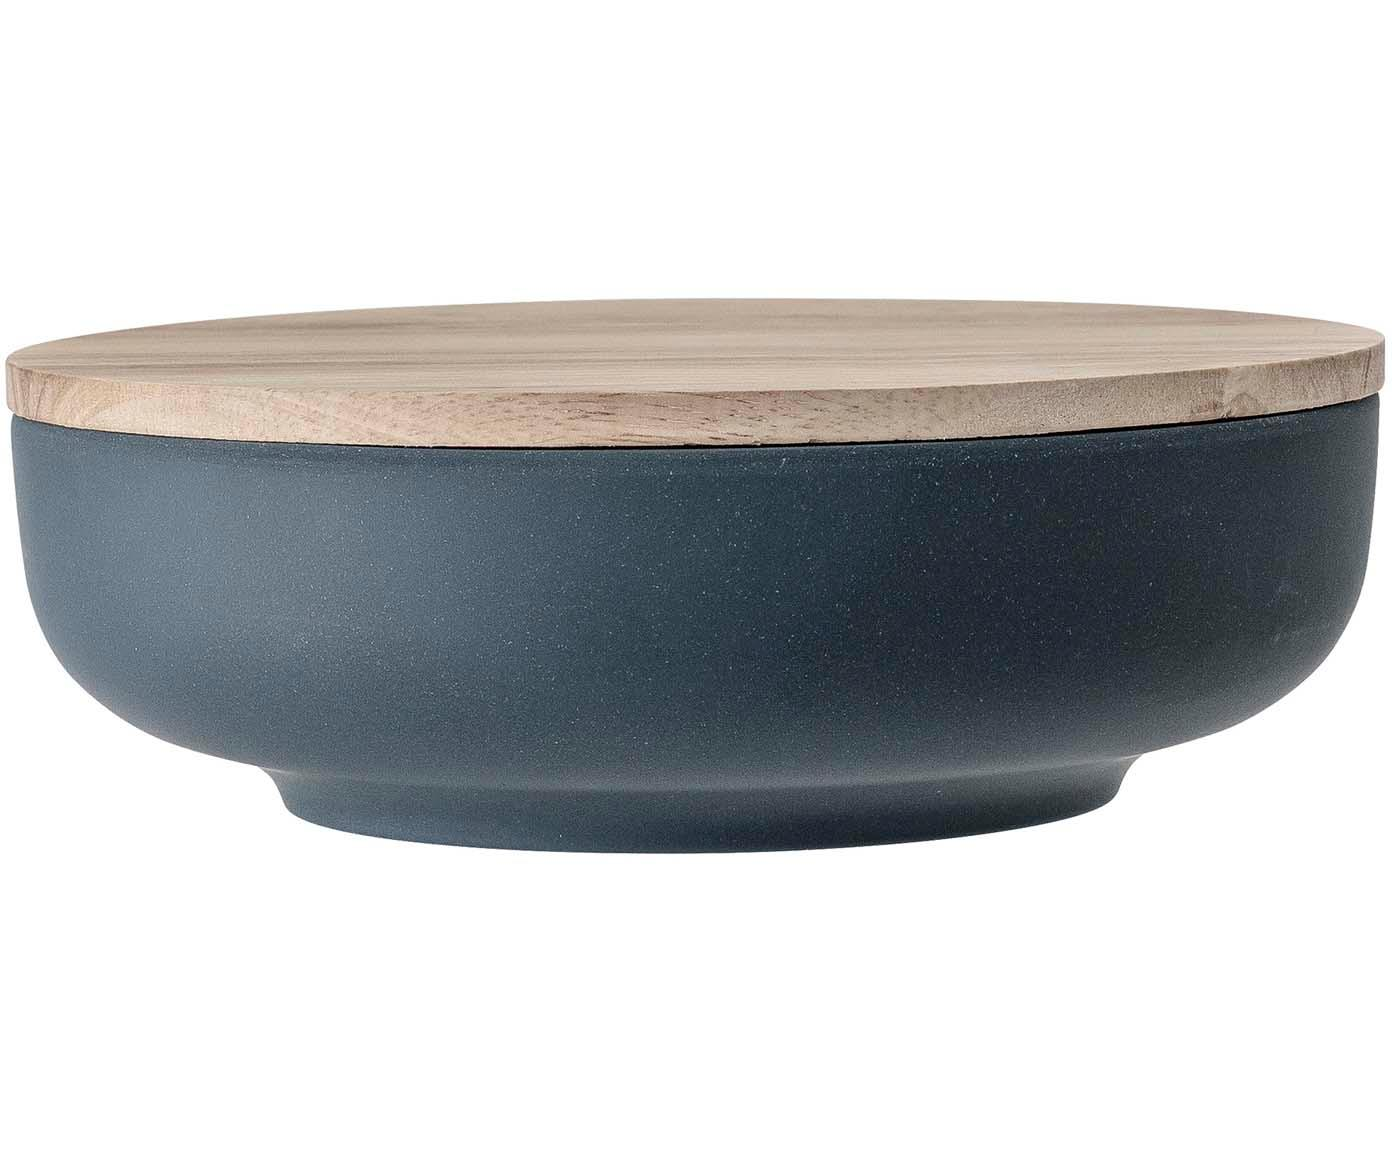 Bote Java, Bol: 50%fibras de bambú, 20%, Azul, beige, Ø 21 x Al 7 cm